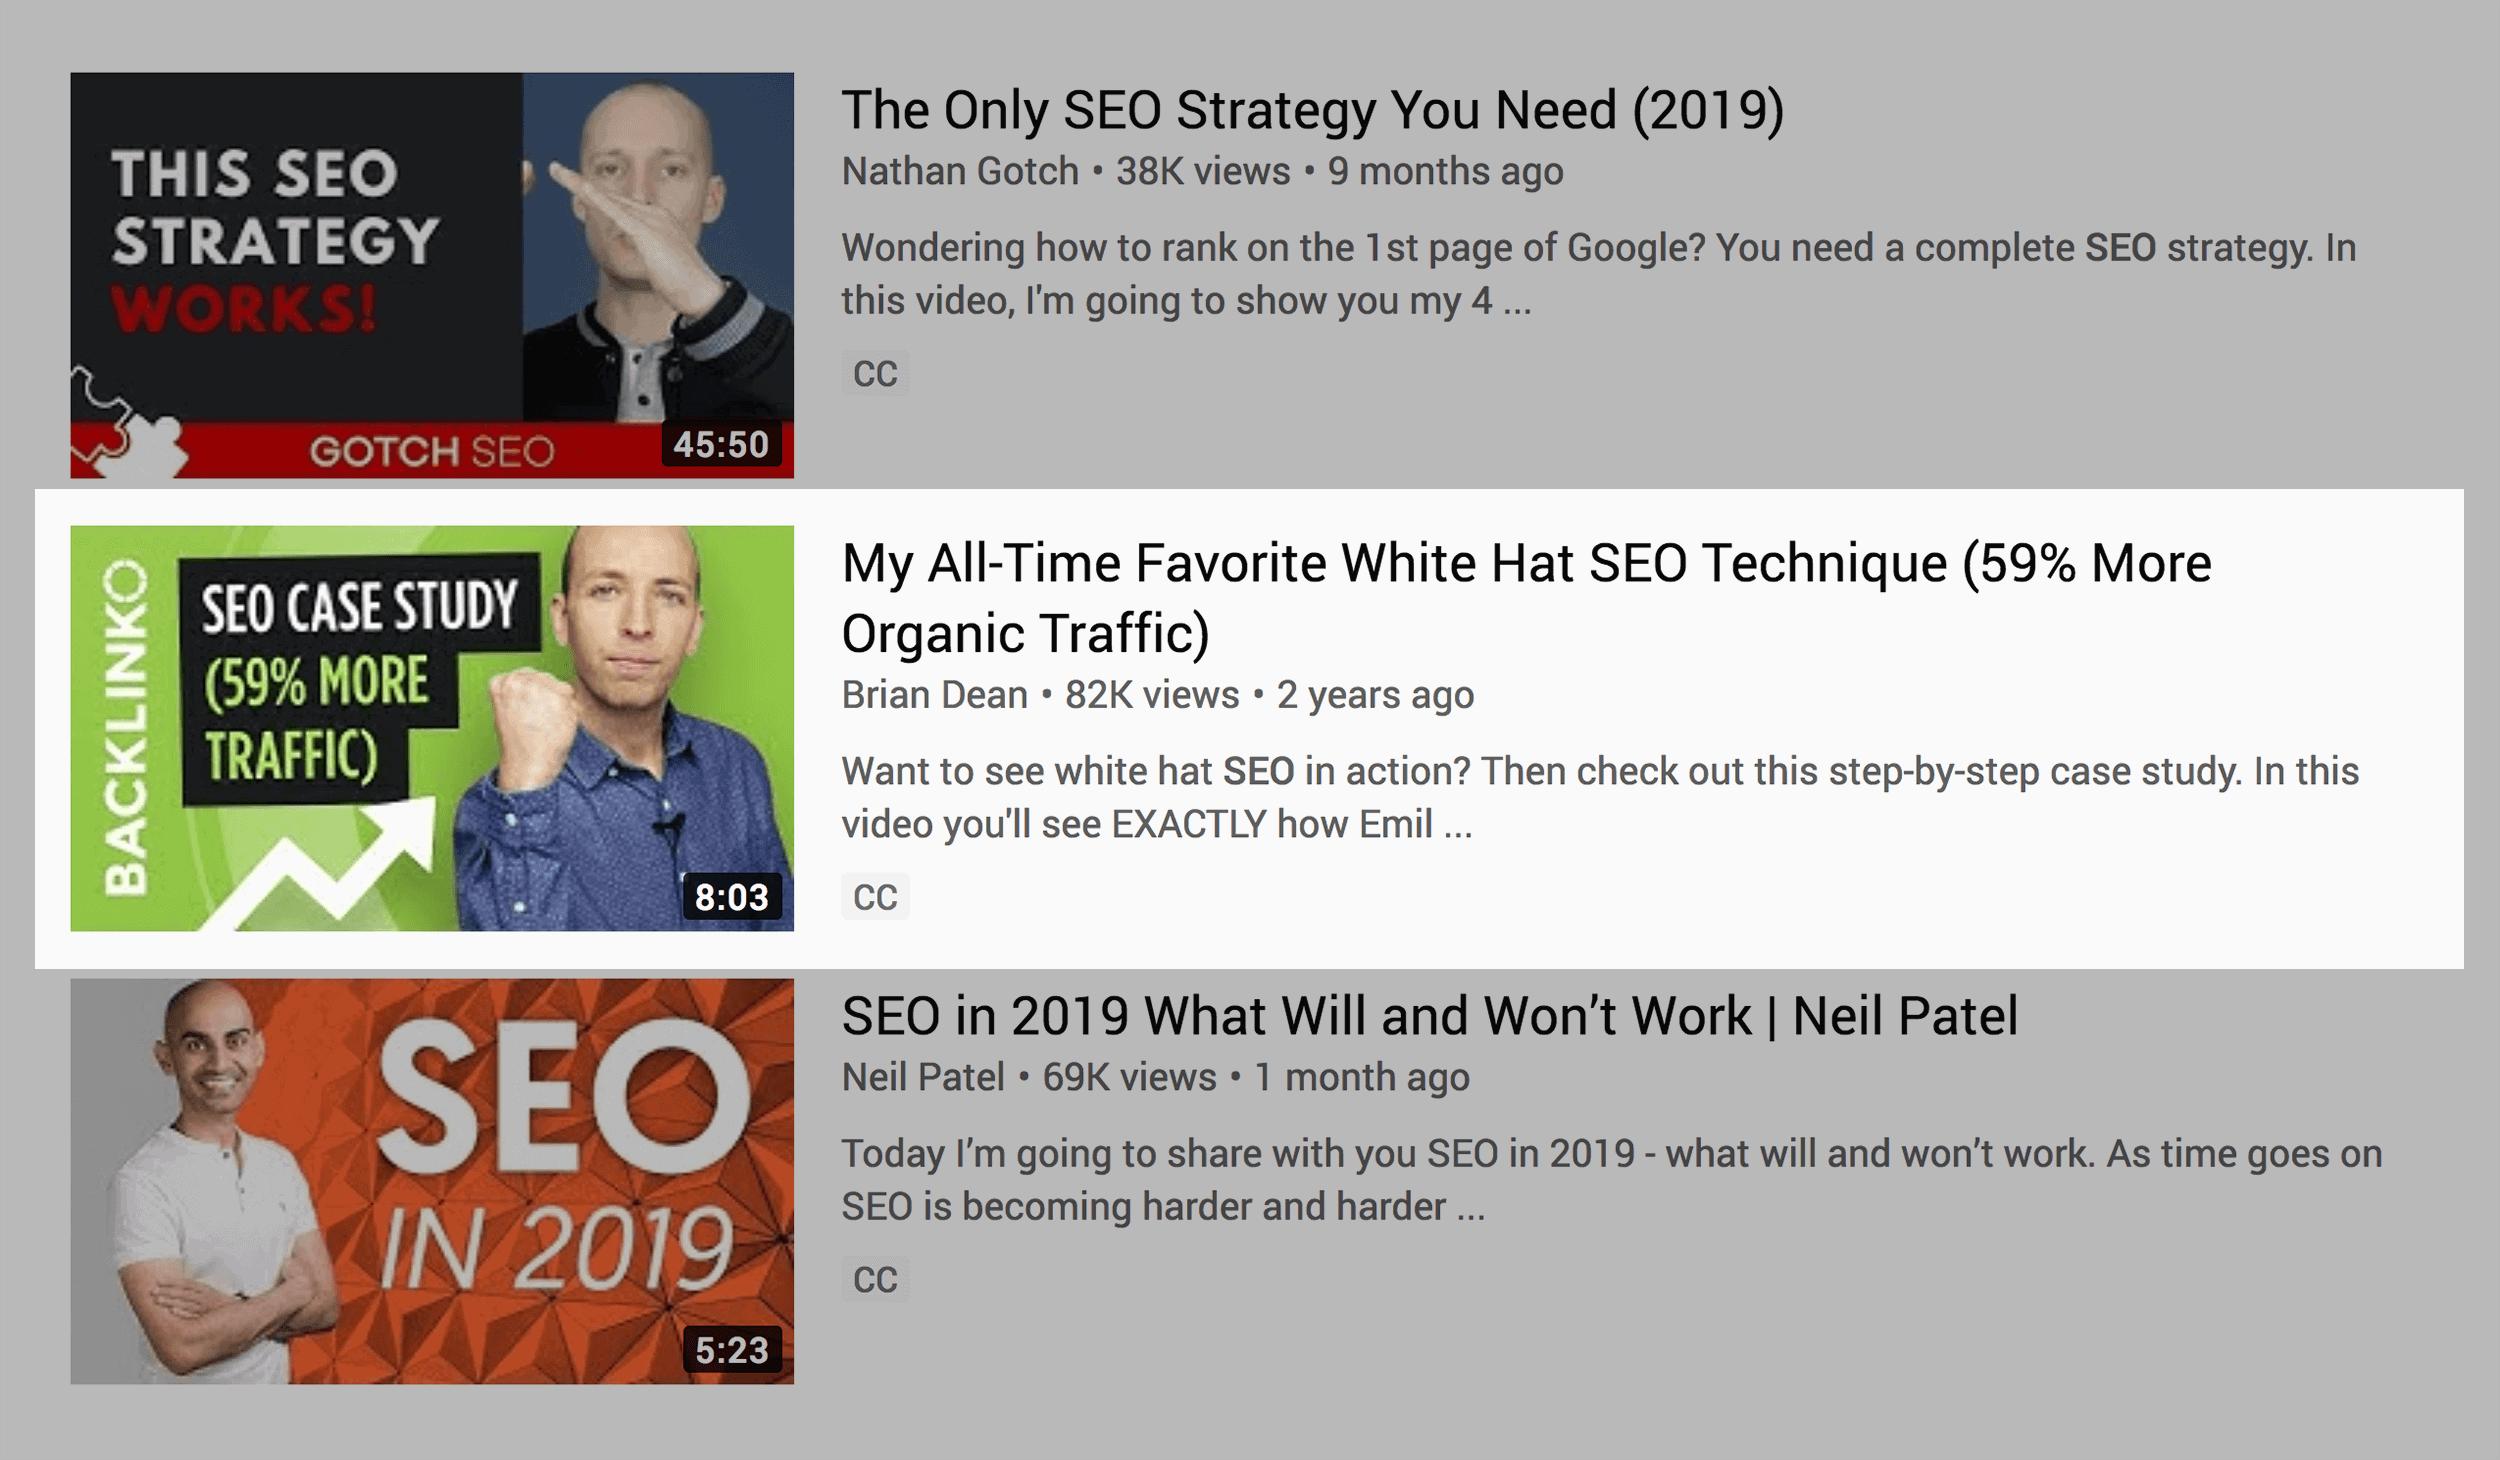 Eye-catching thumbnails